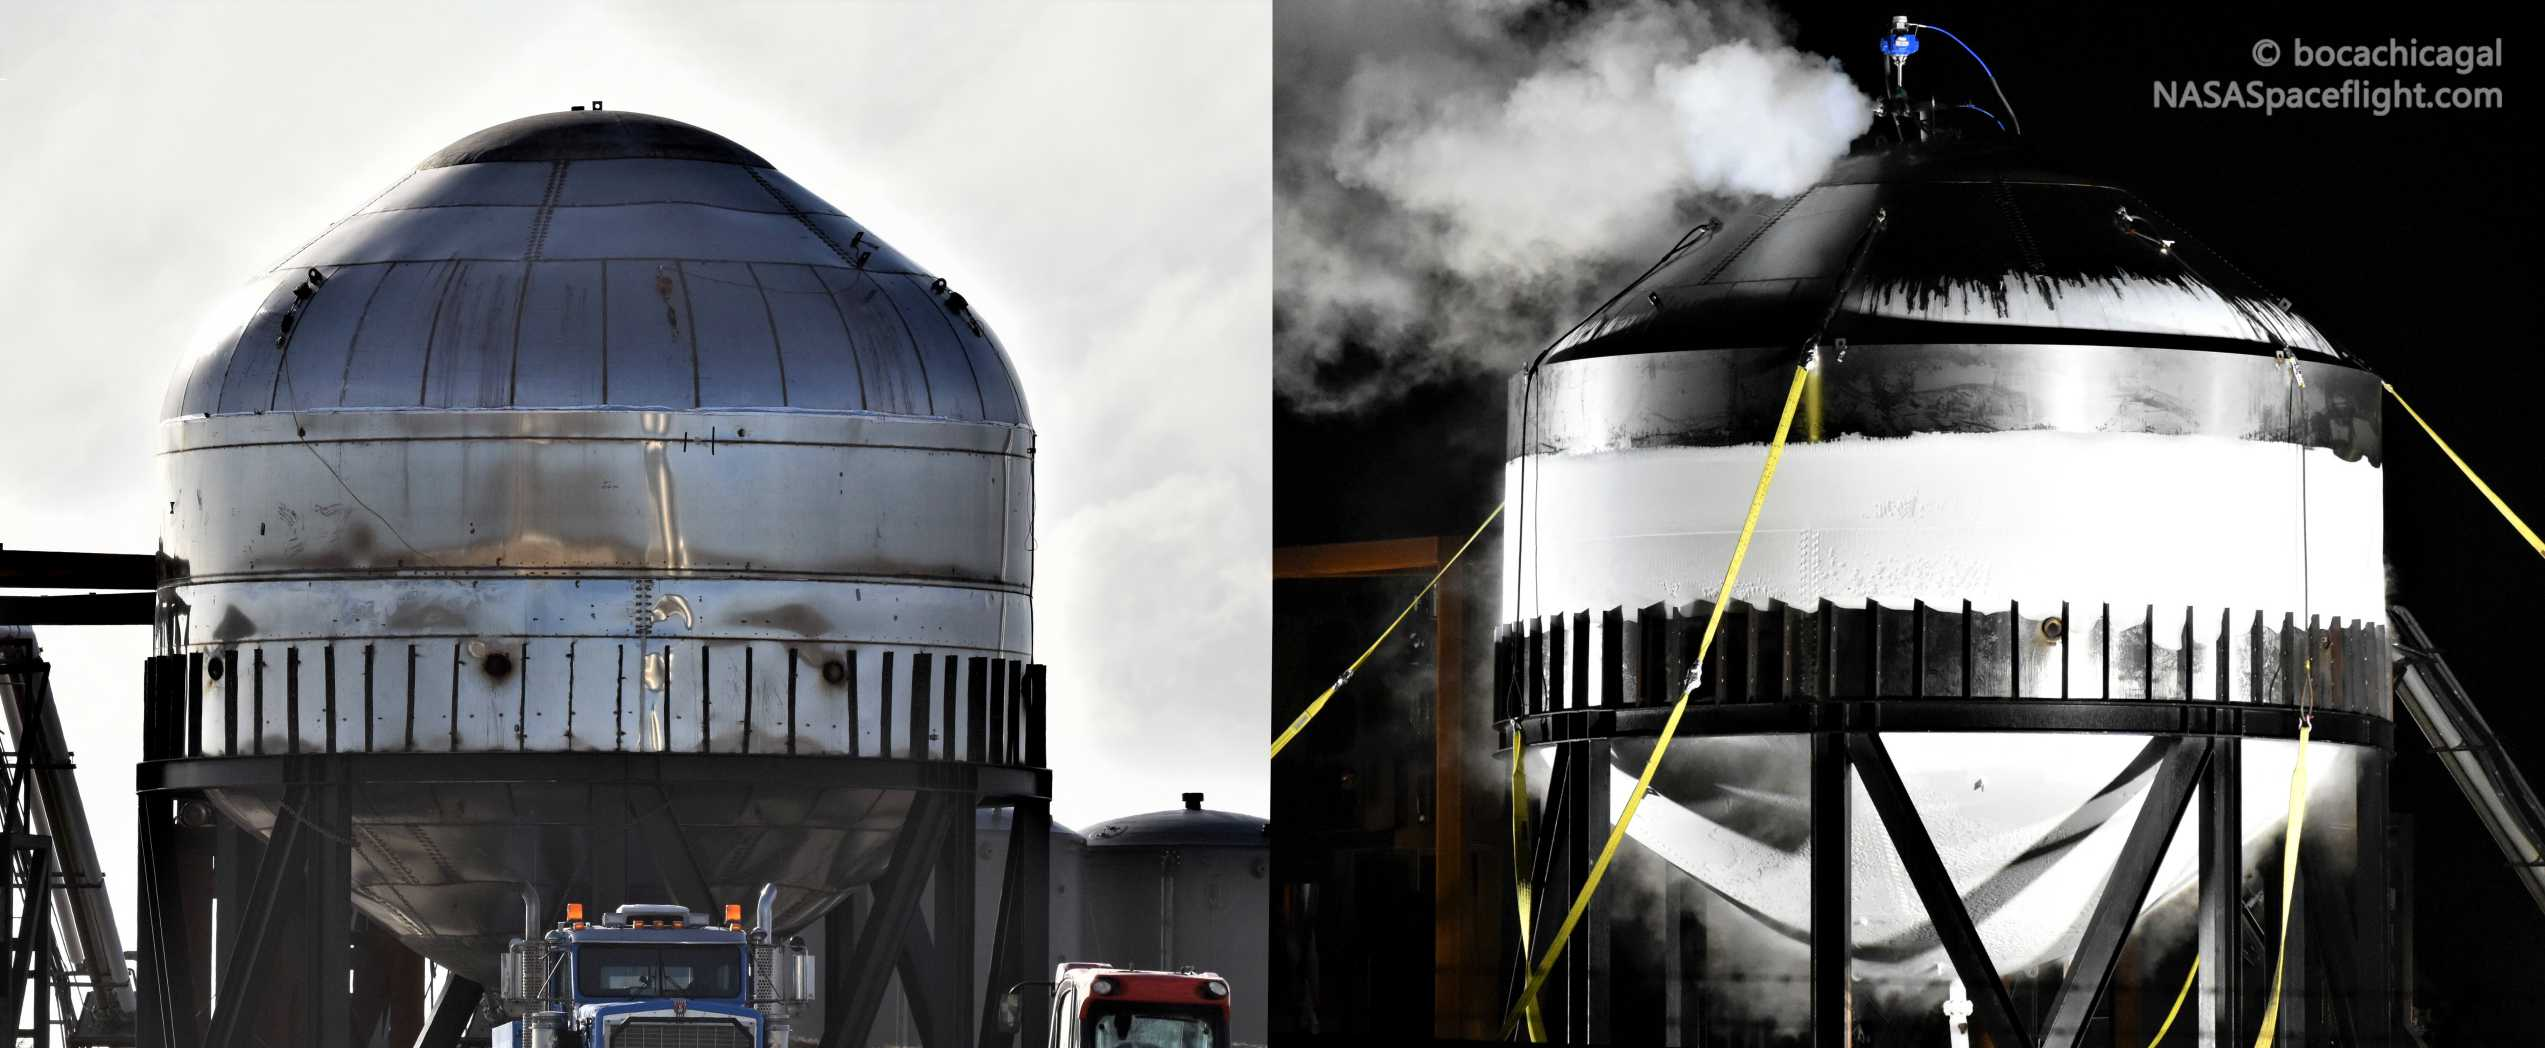 Starship test tanks #1 #2 Jan 2020 (NASASpaceflight – bocachicagal) 1 crop (c)